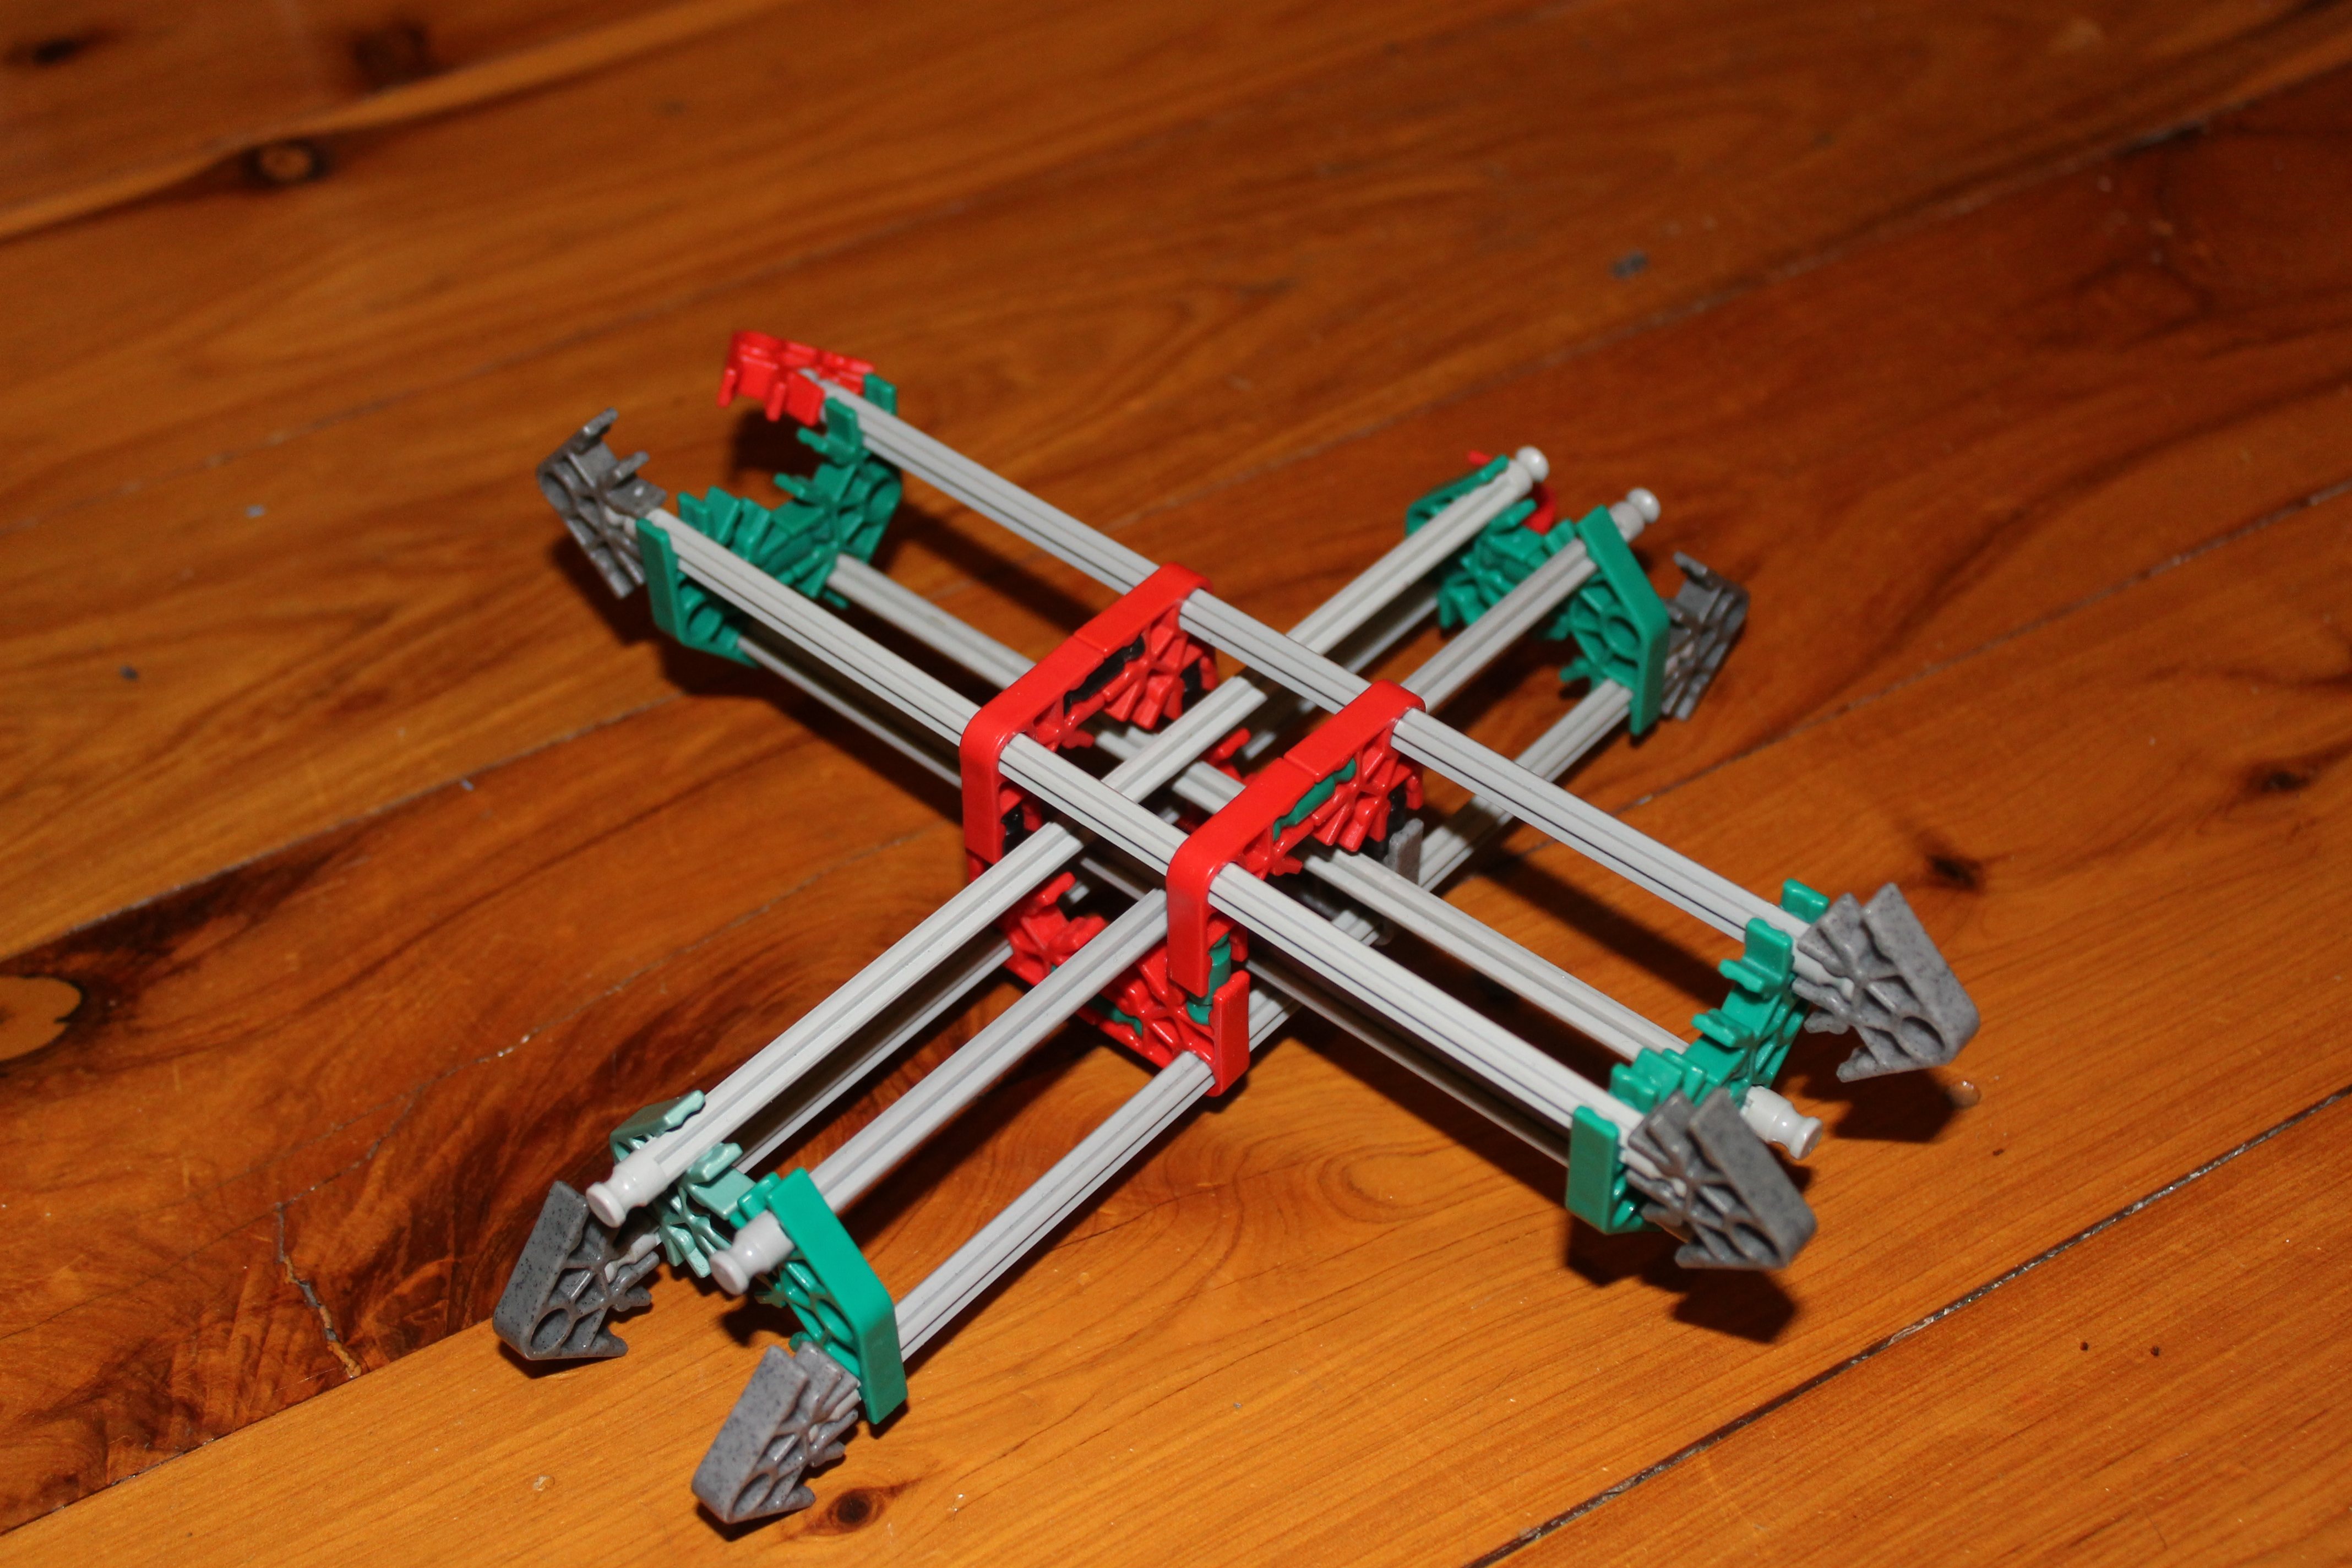 Picture of K'nexRap 3D Printer Prototype